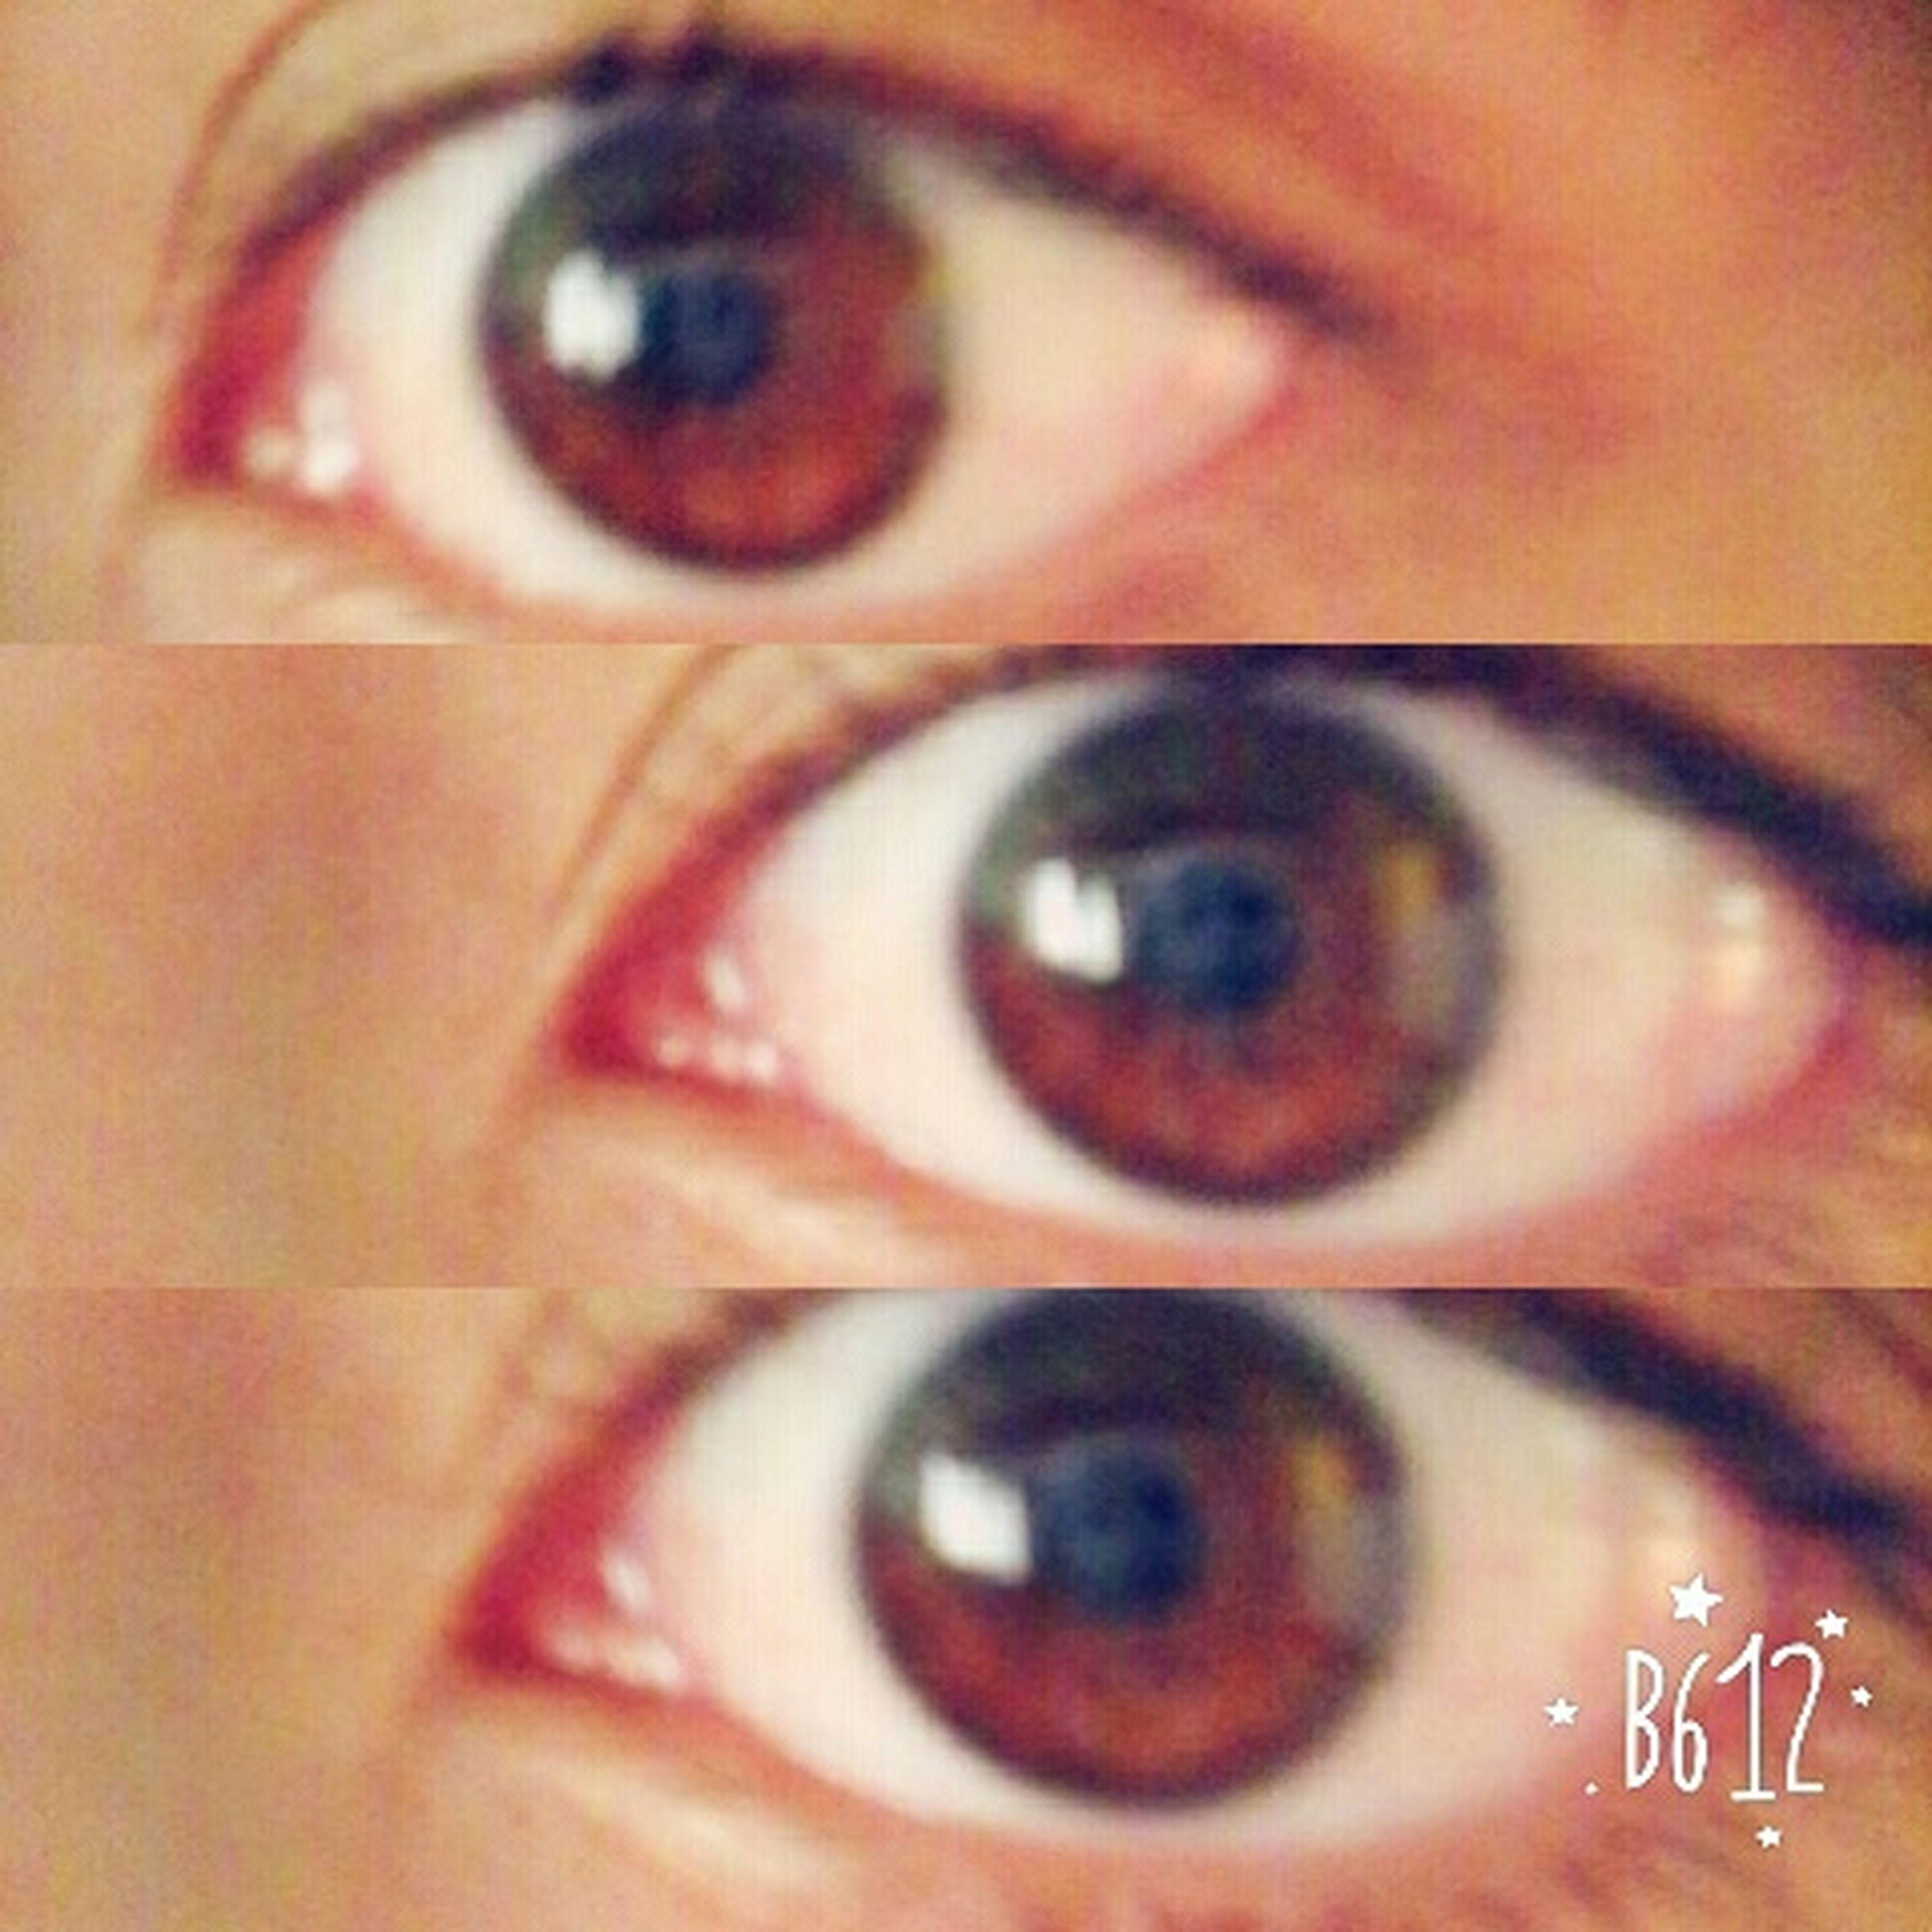 close-up, indoors, full frame, human eye, part of, extreme close-up, backgrounds, selective focus, eyesight, extreme close up, detail, macro, eyelash, person, vision, cropped, iris - eye